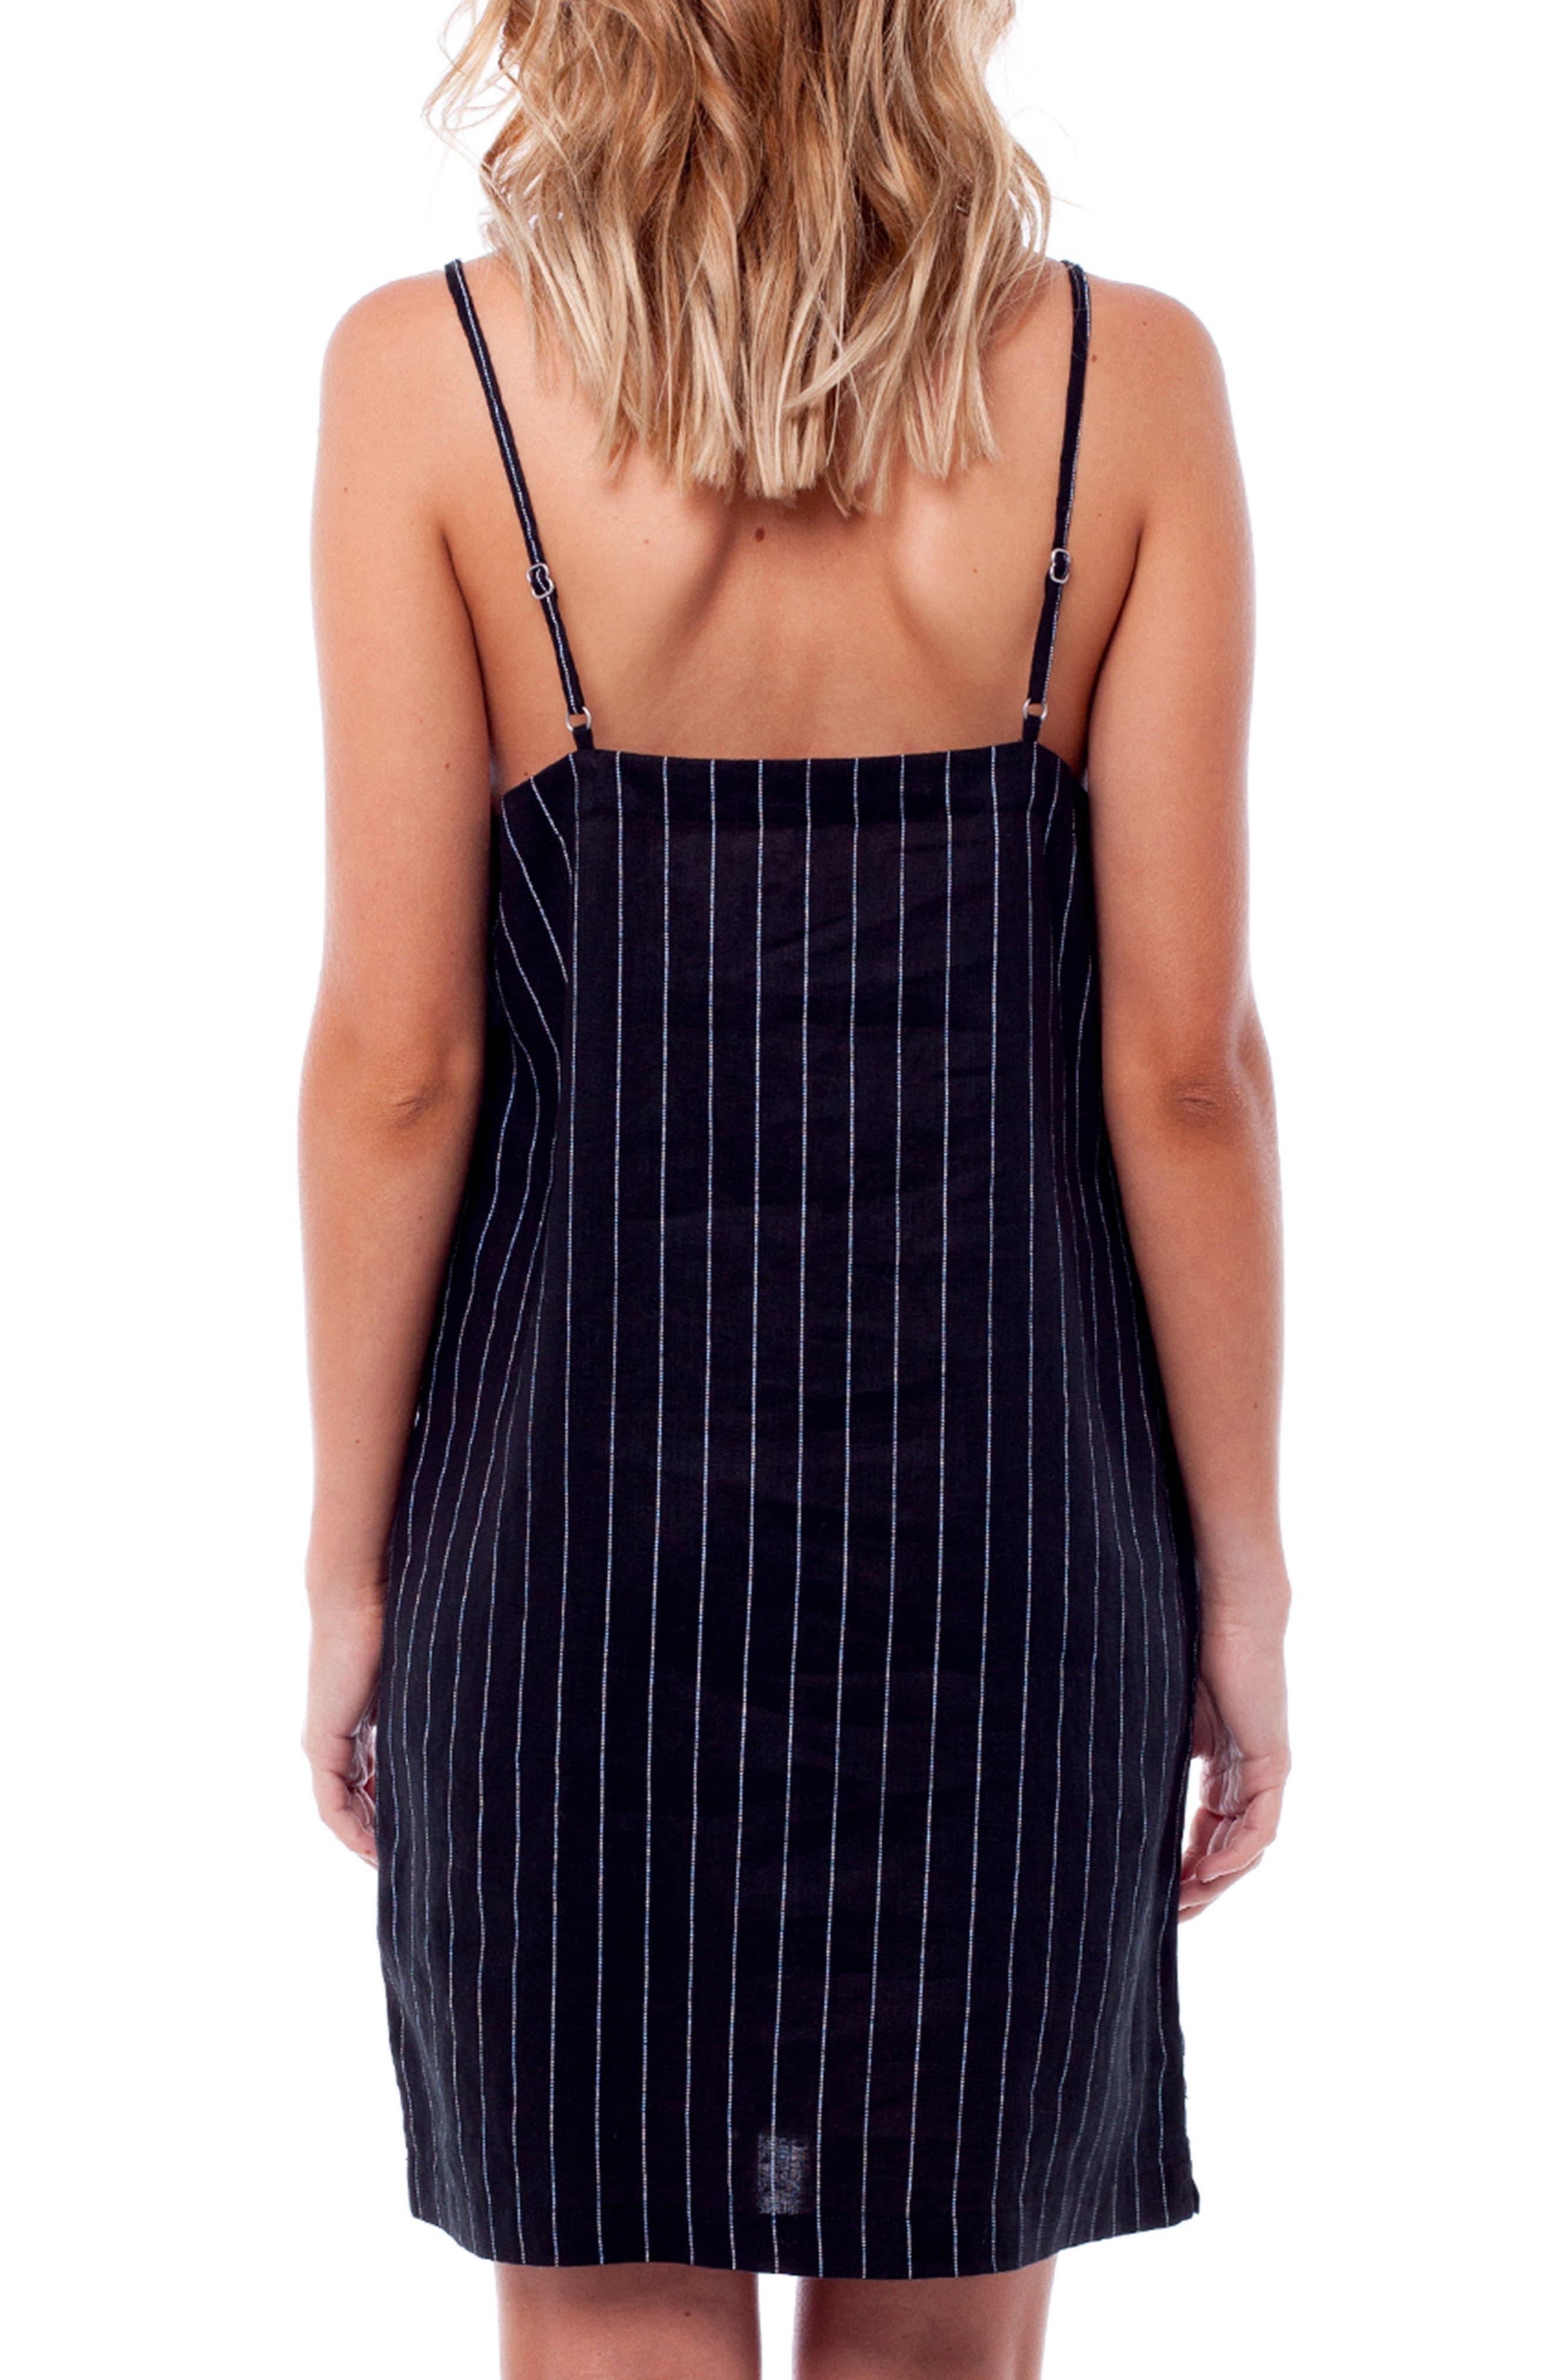 Catalina Cover-Up Dress,                             Alternate thumbnail 2, color,                             BLACK